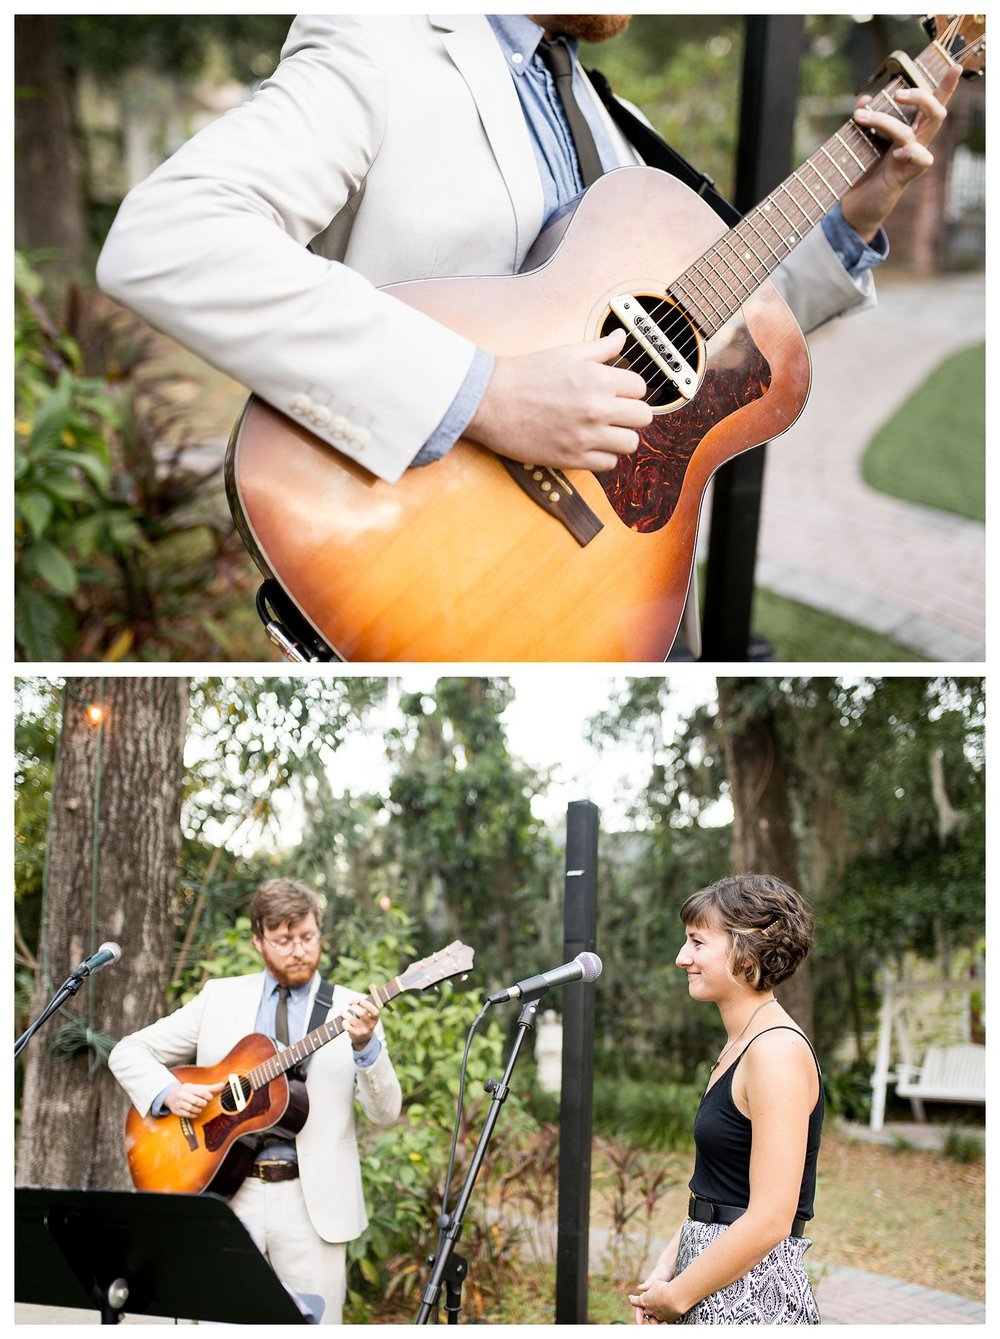 everleigh-photography-cincinnati-wedding-photographer-cincinnati-wedding-photography-sweetwater-branch-inn-gainesville-florida-wedding-25